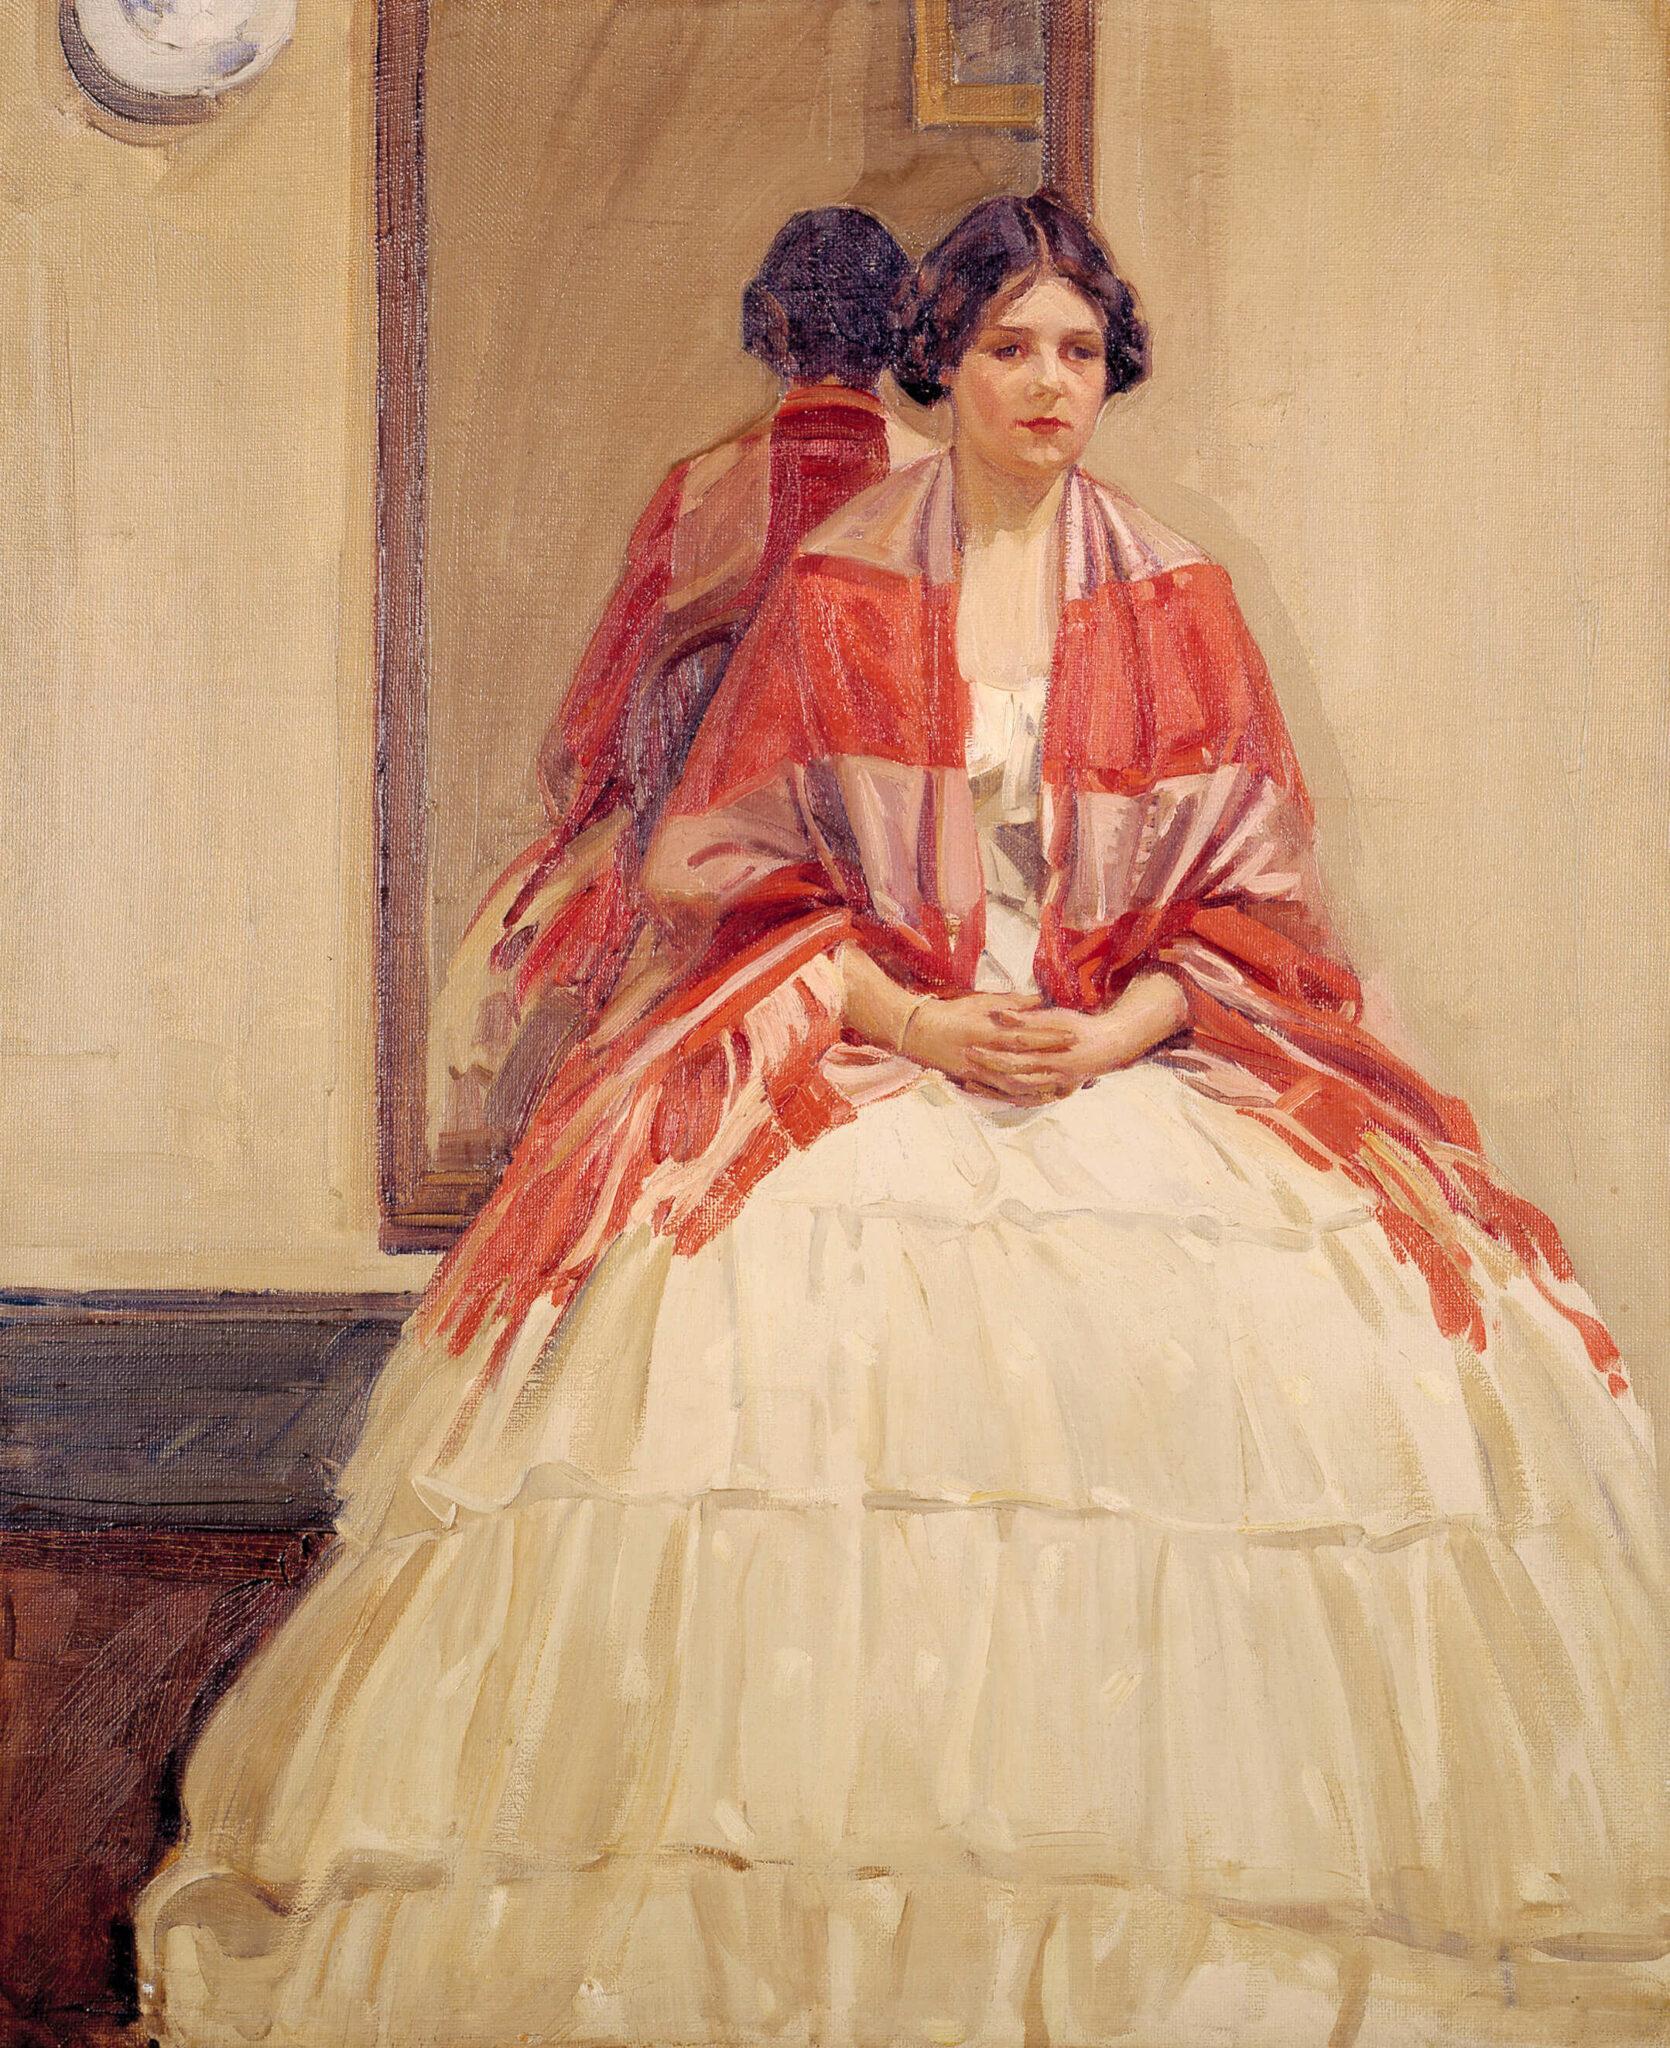 Helen McNicoll, The Victorian Dress, 1914